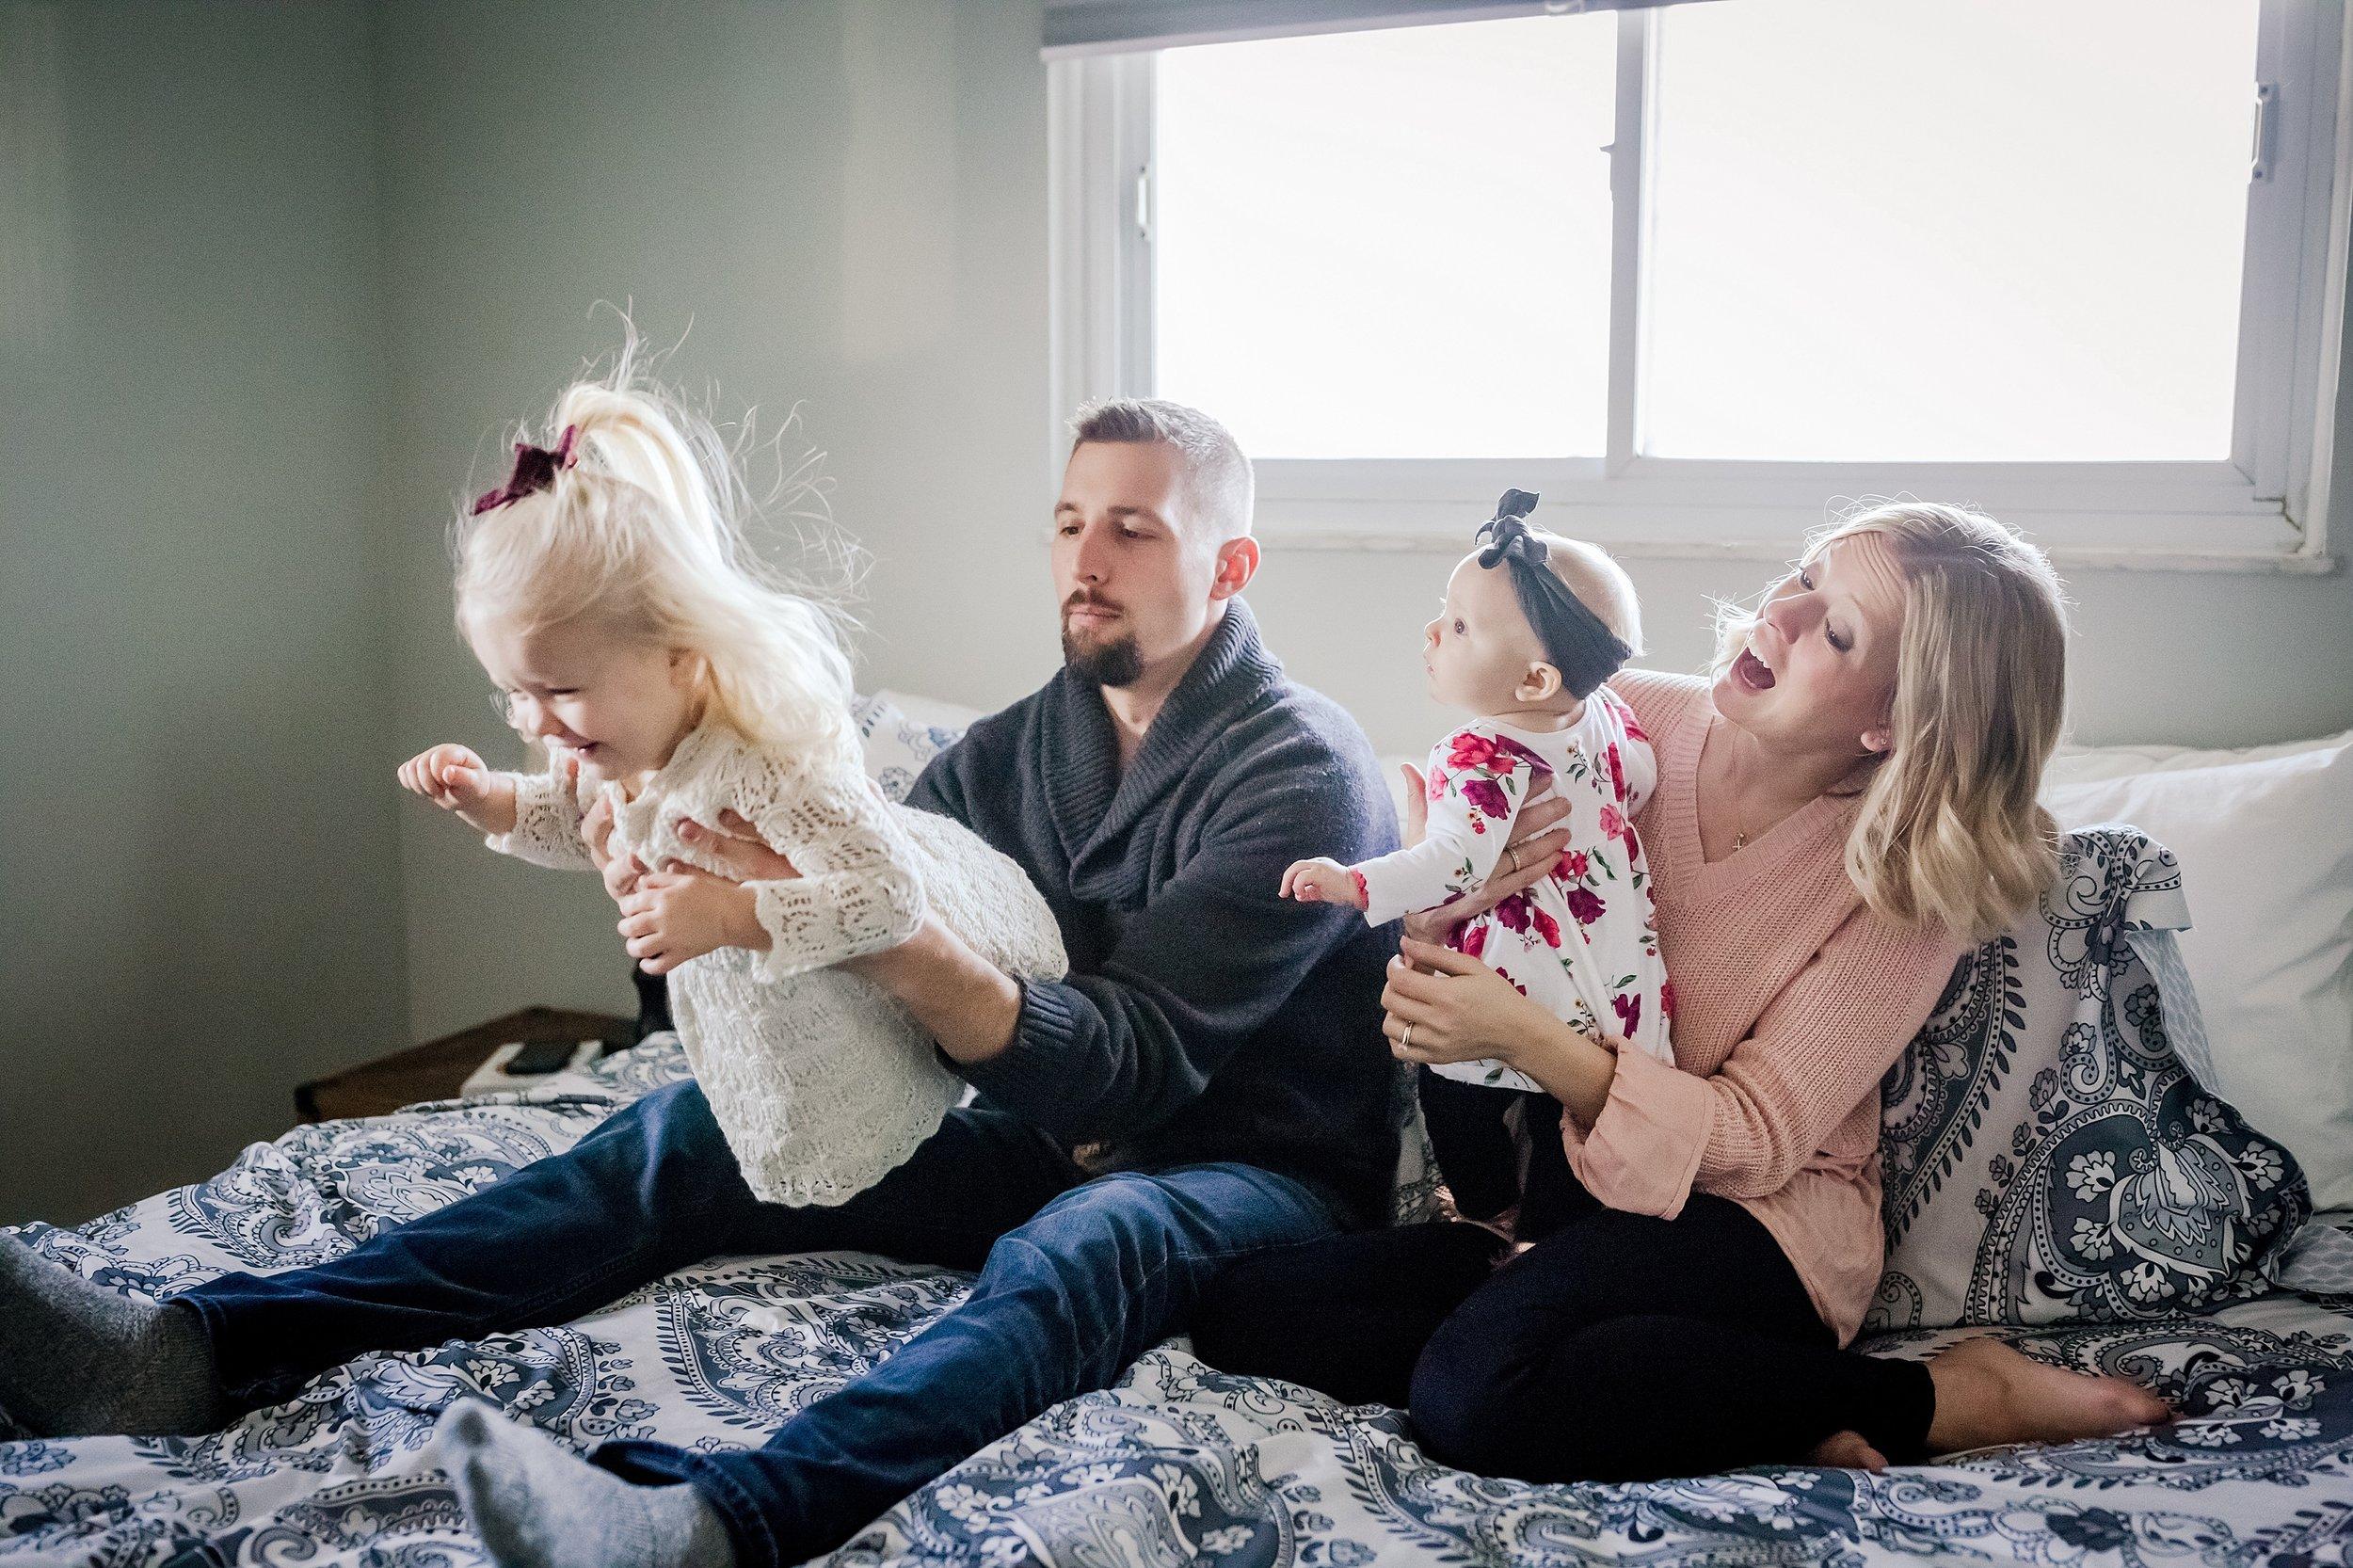 Lehigh-Valley-In-Home-Family-Photographer_0024.jpg